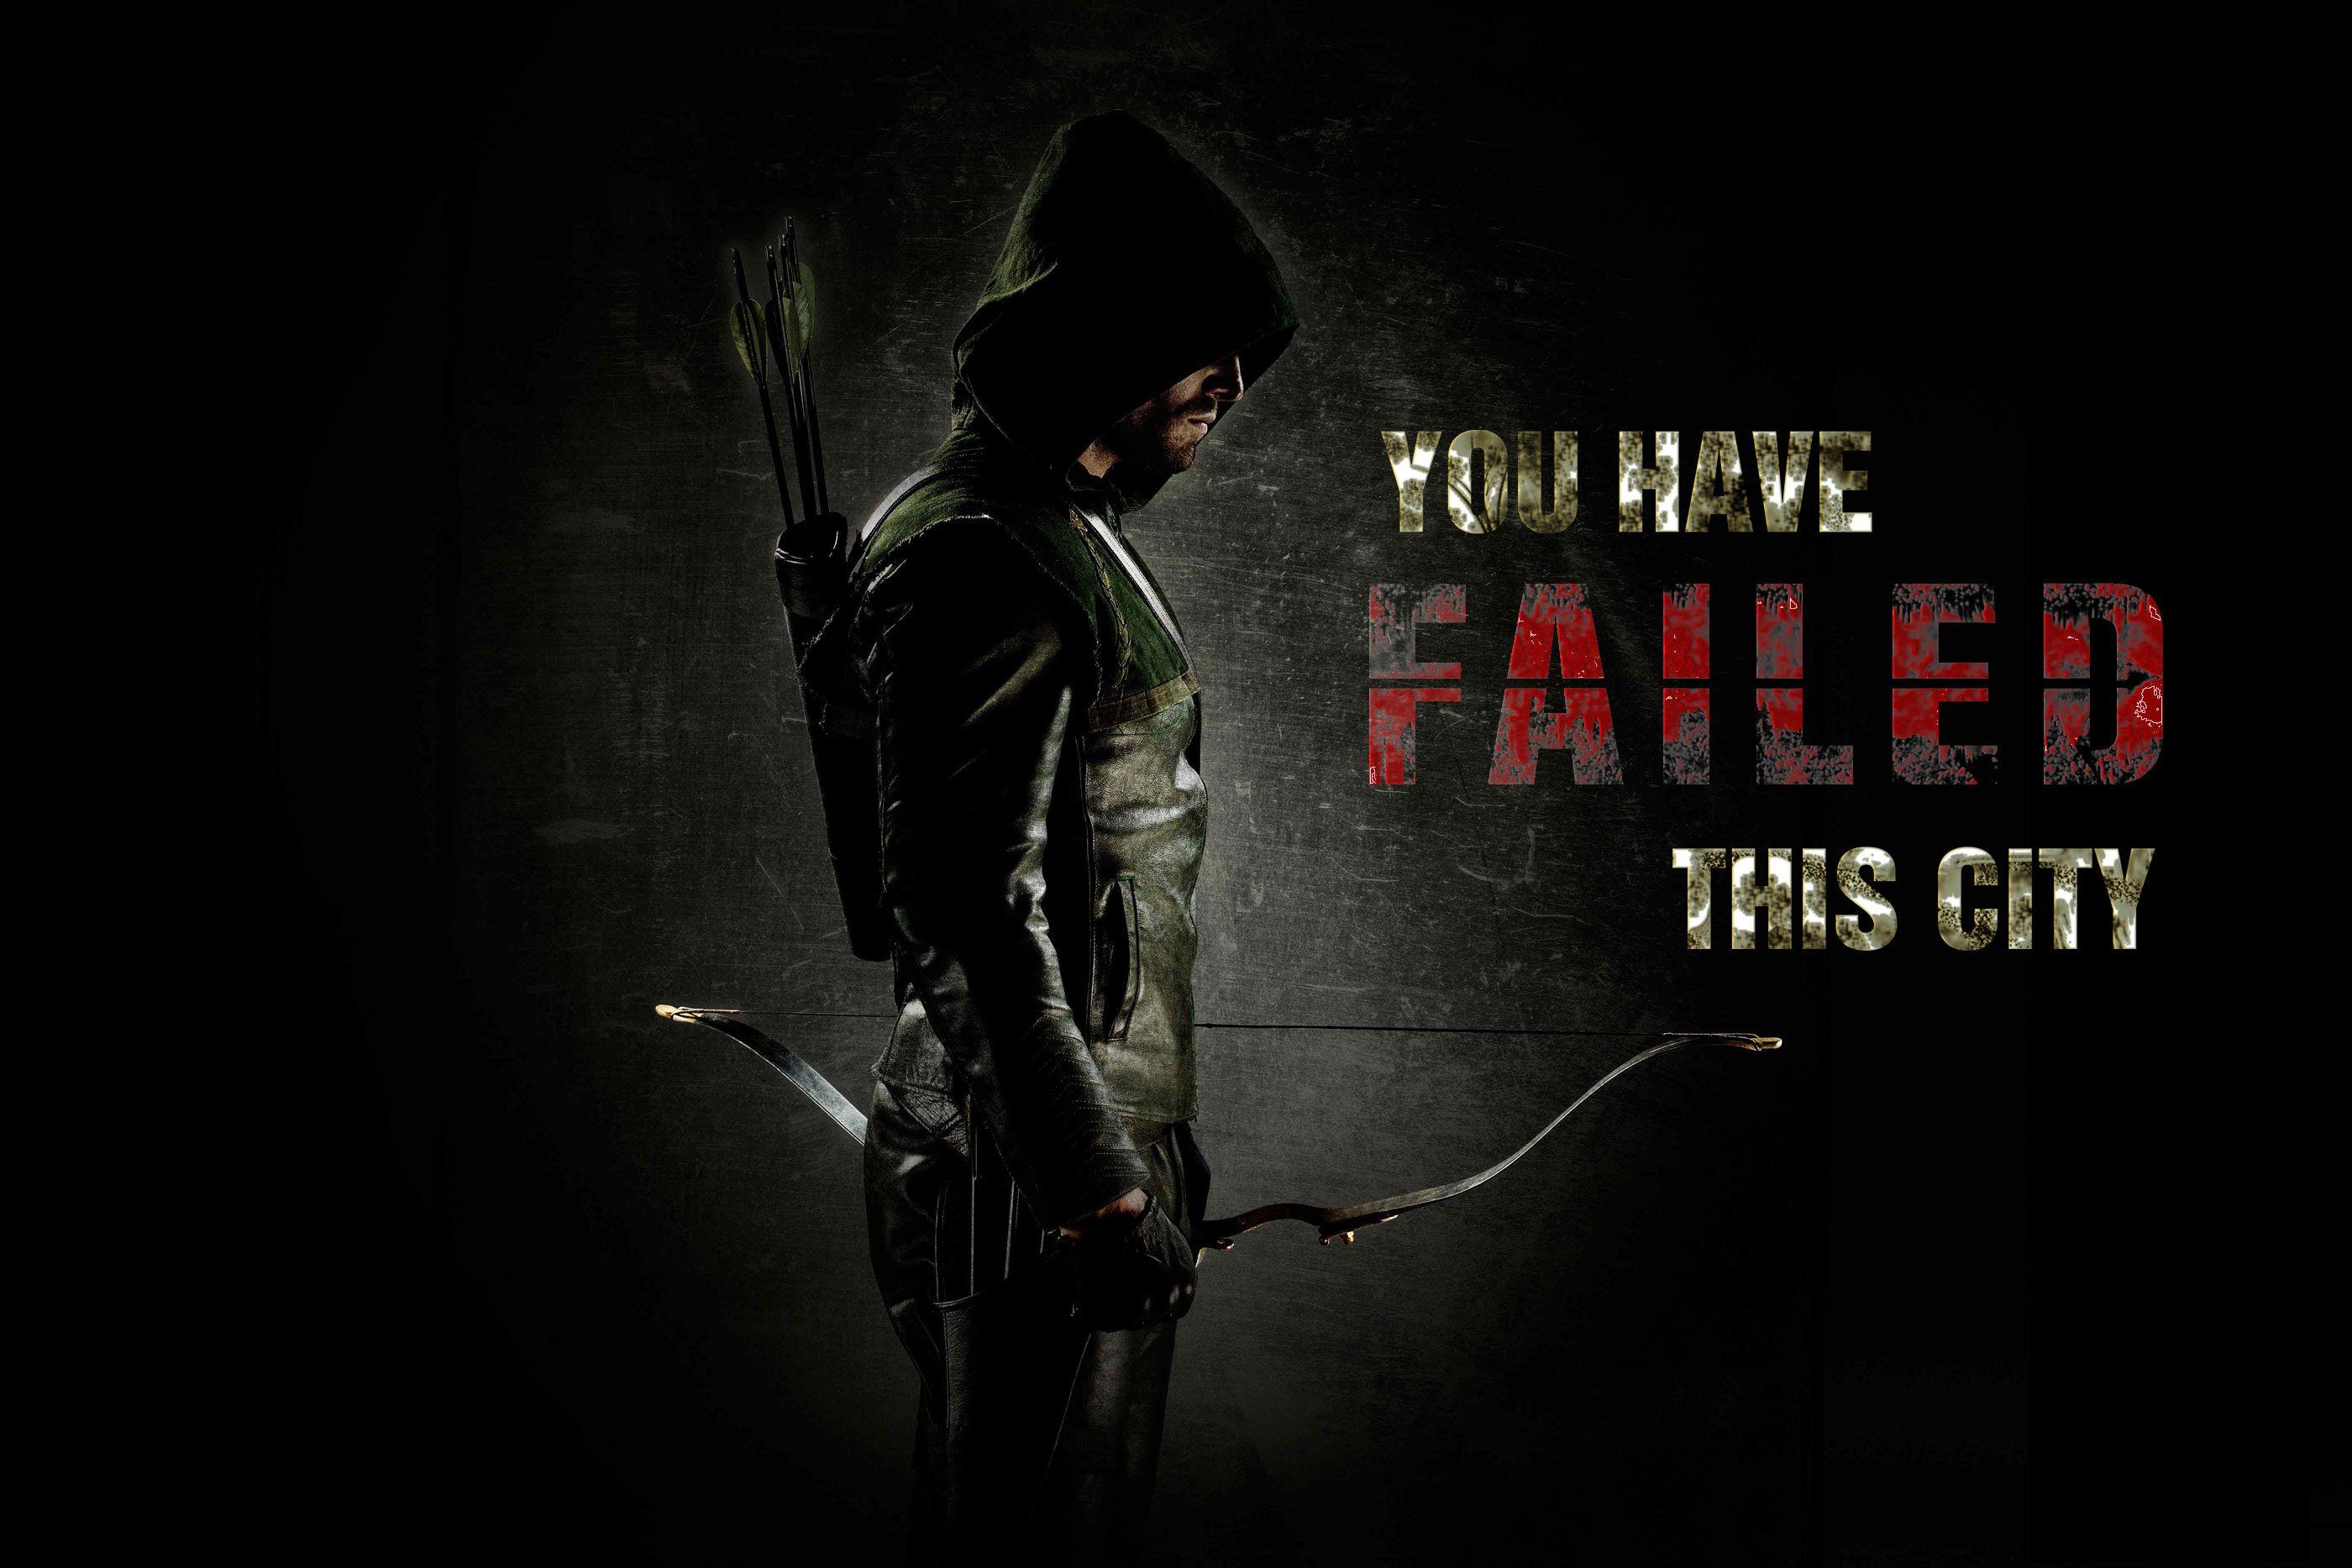 Request Quot You Have Failed This City Quot Wallpaper Arrow Arrow Tv Series Team Arrow City Wallpaper